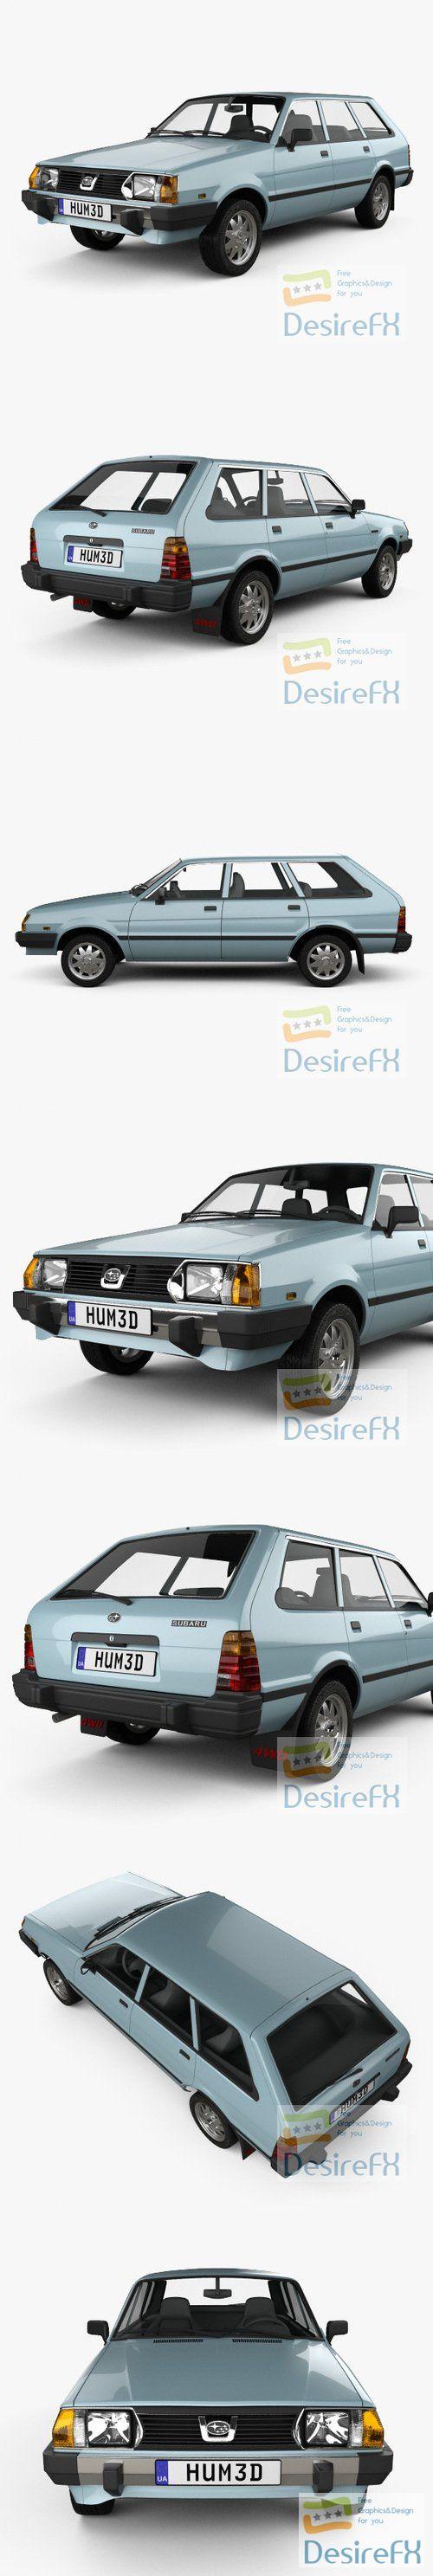 Subaru Leone estate 1978 3D Model